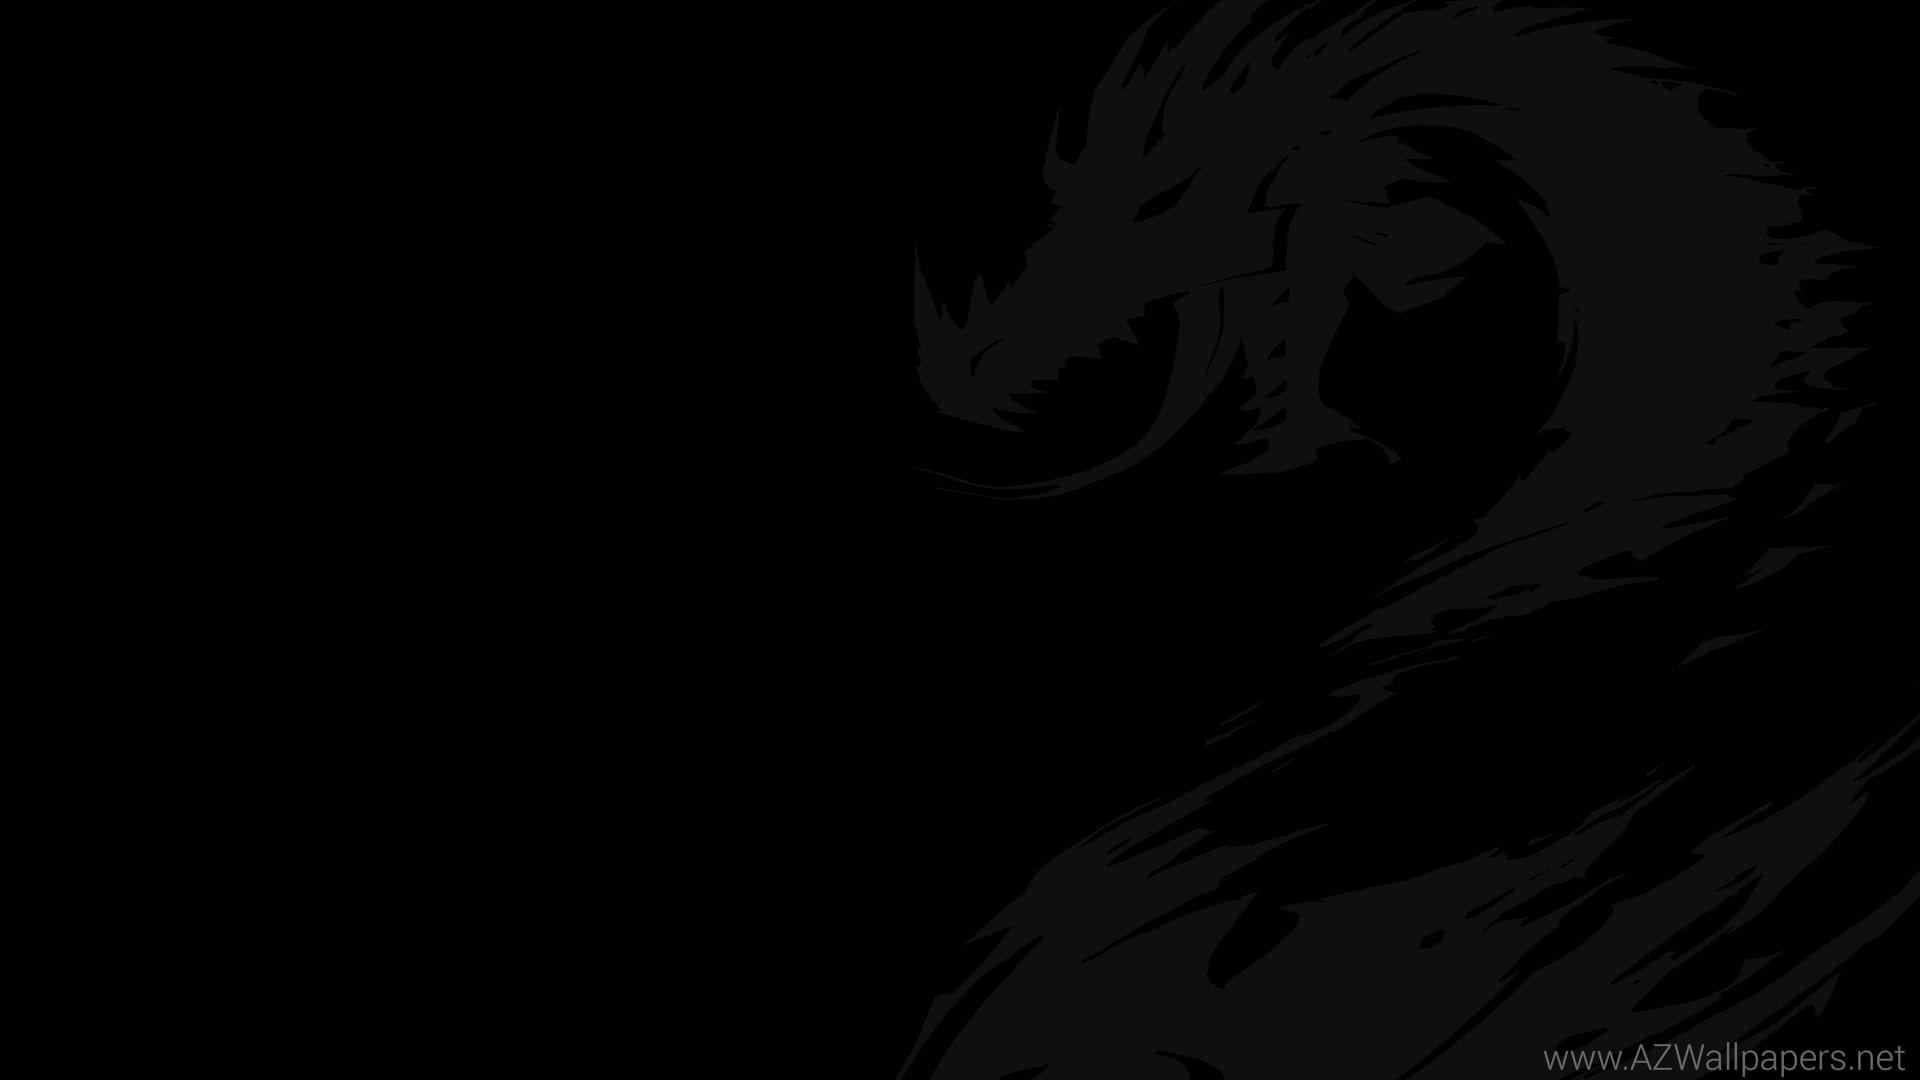 … solid black wallpaper 69 wallpapers hd wallpapers …